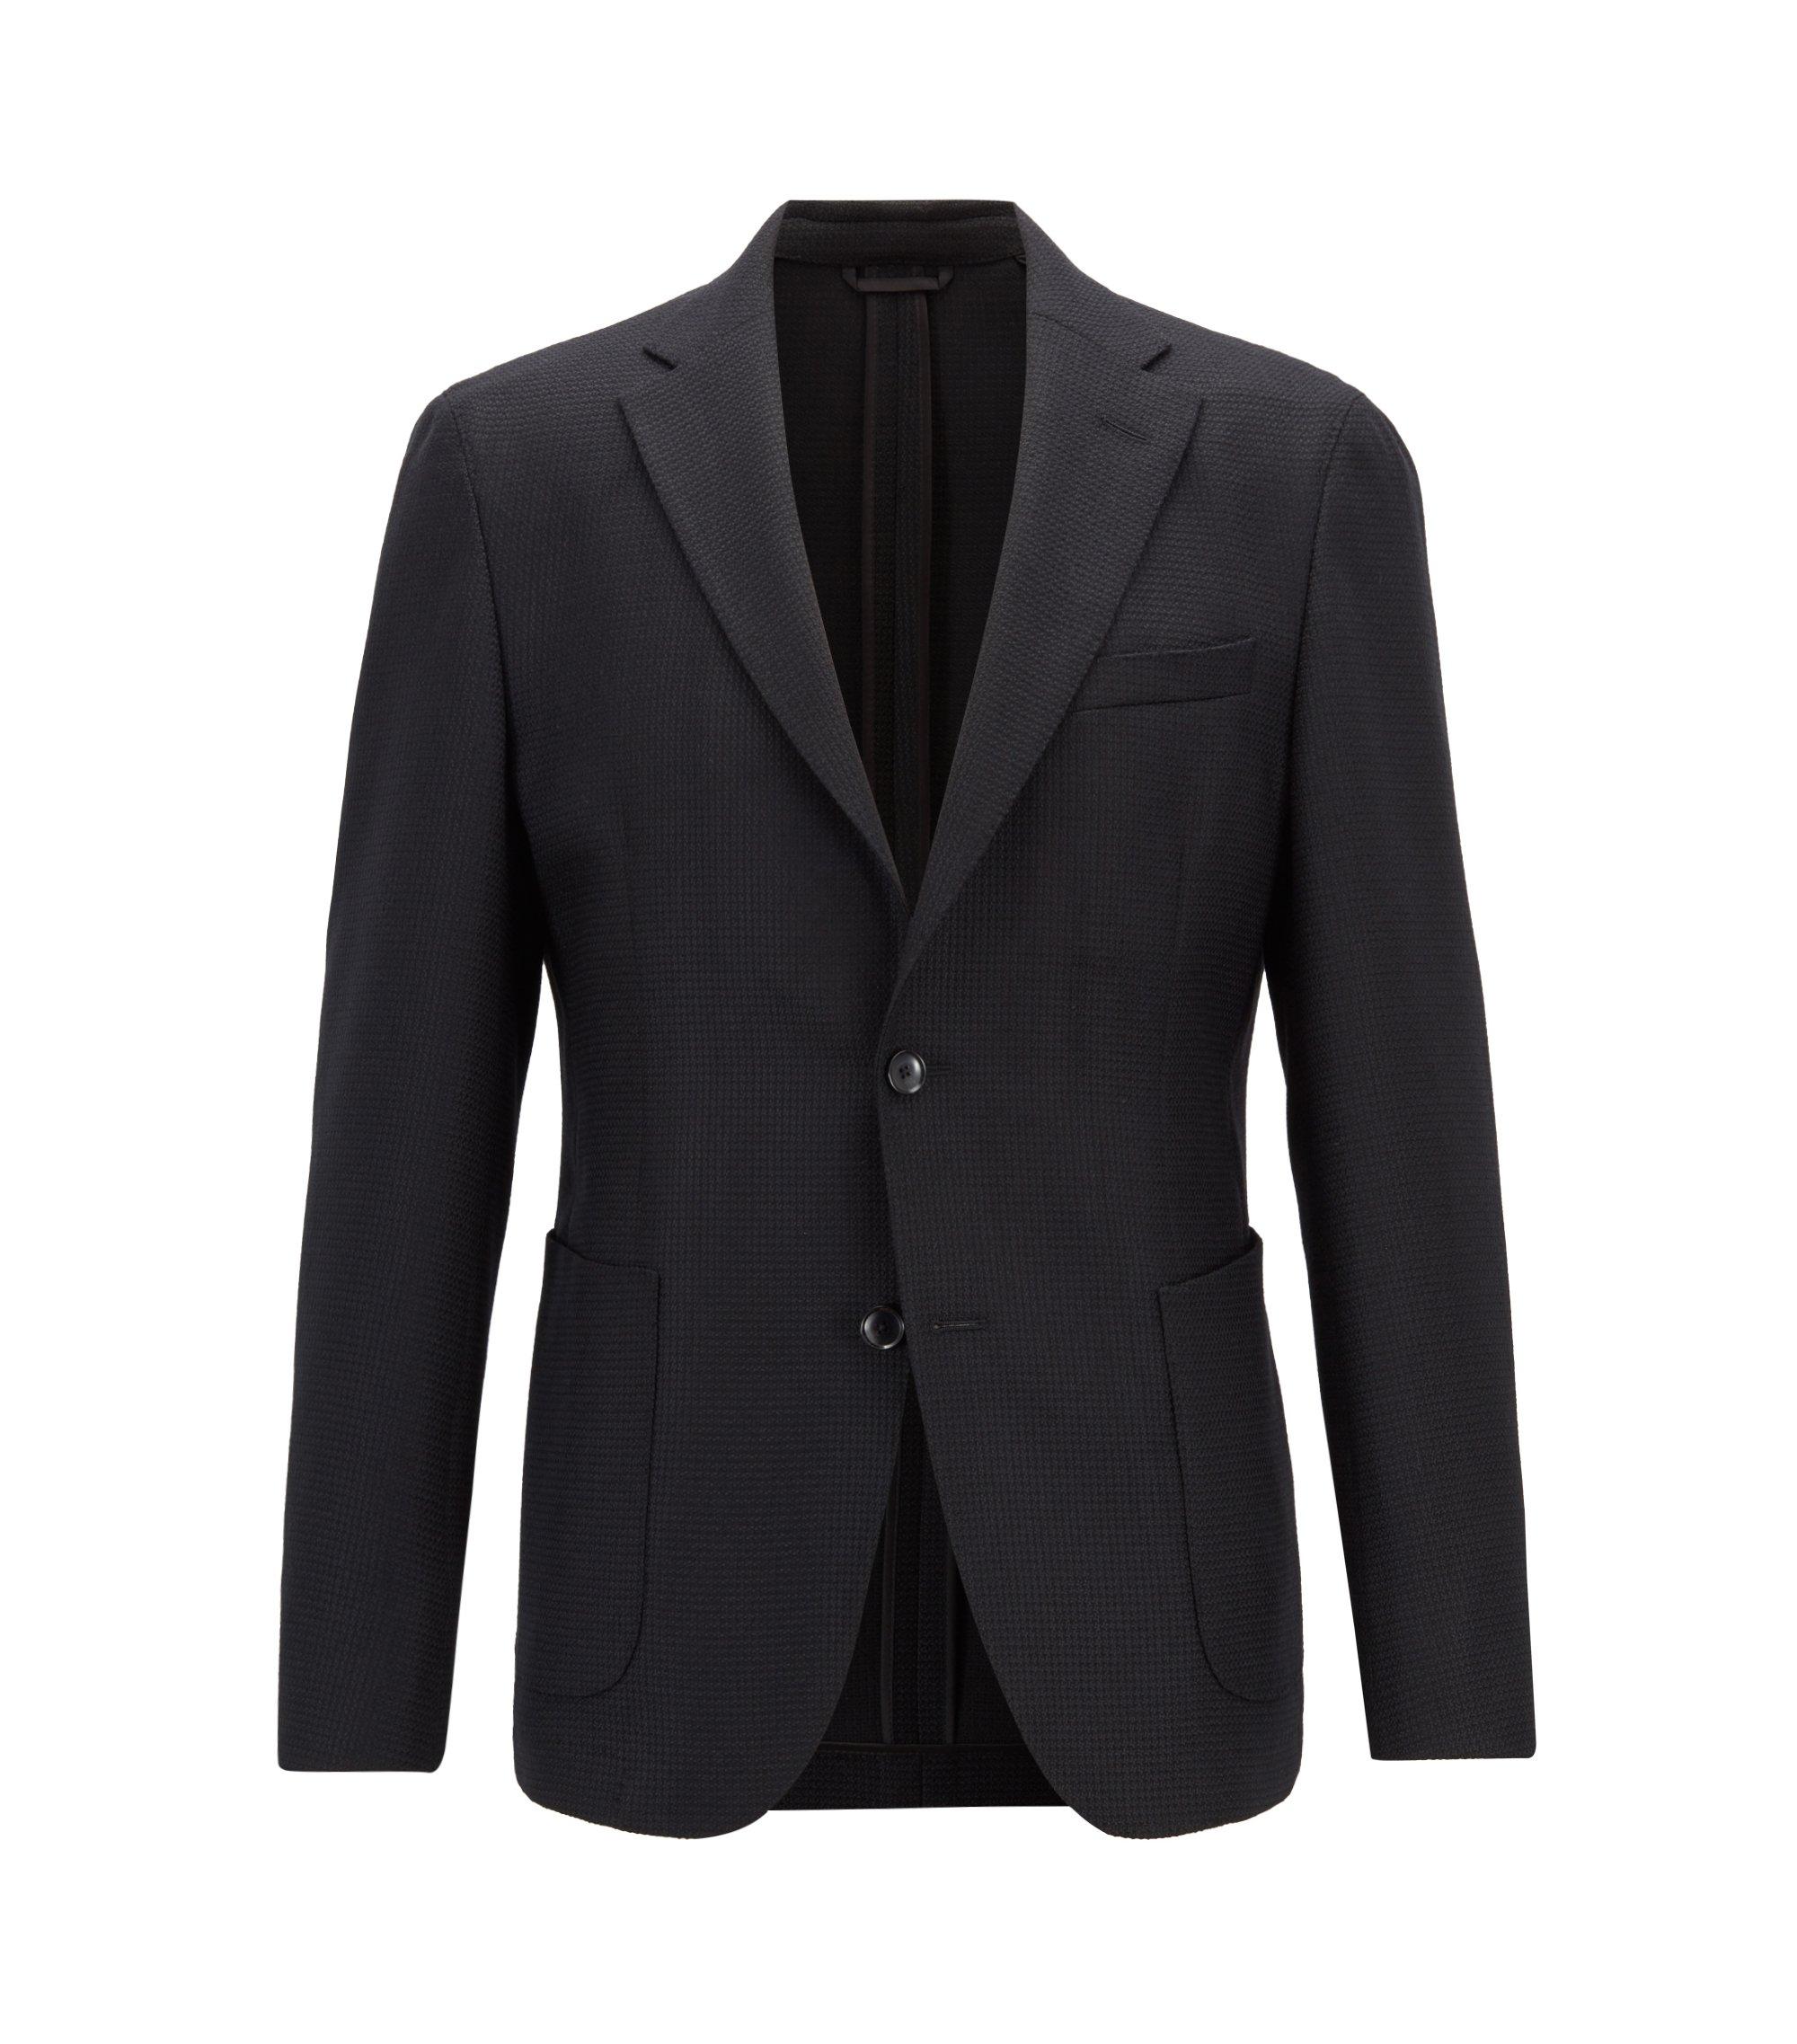 Slim-fit blazer in micro-structured stretch virgin wool, Black